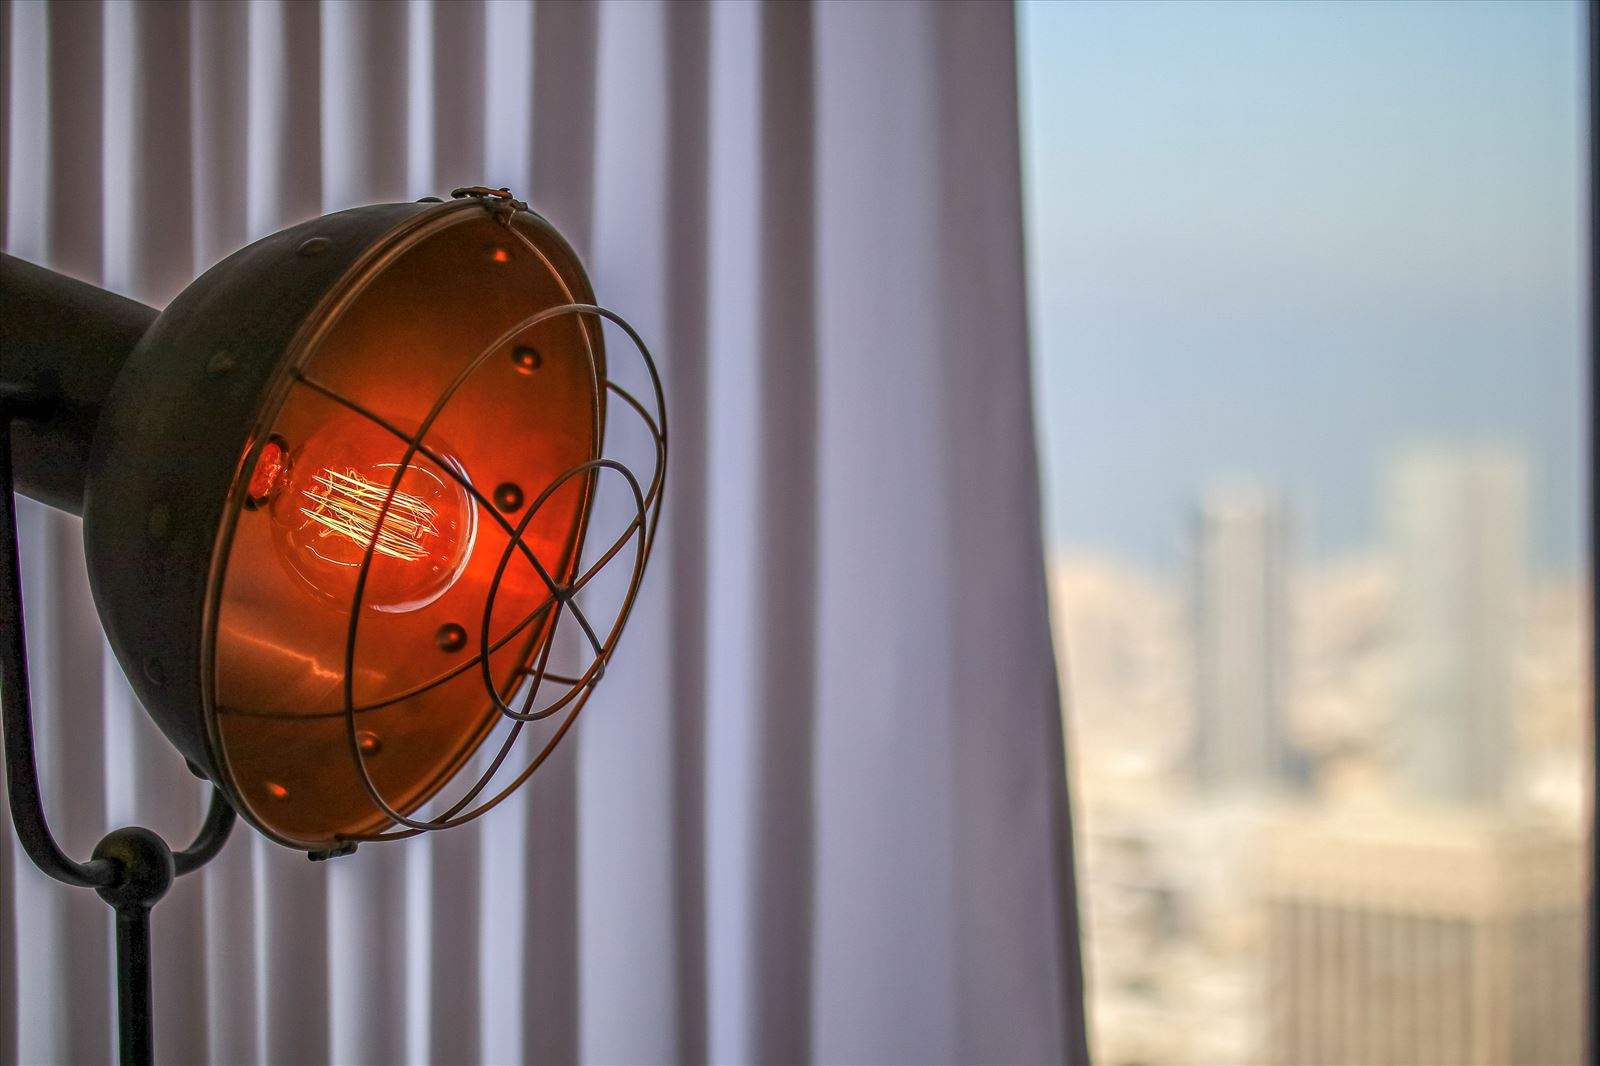 Pie Technology Office - עיצוב תאורה בחלל המשרד על ידי קמחי תאורה